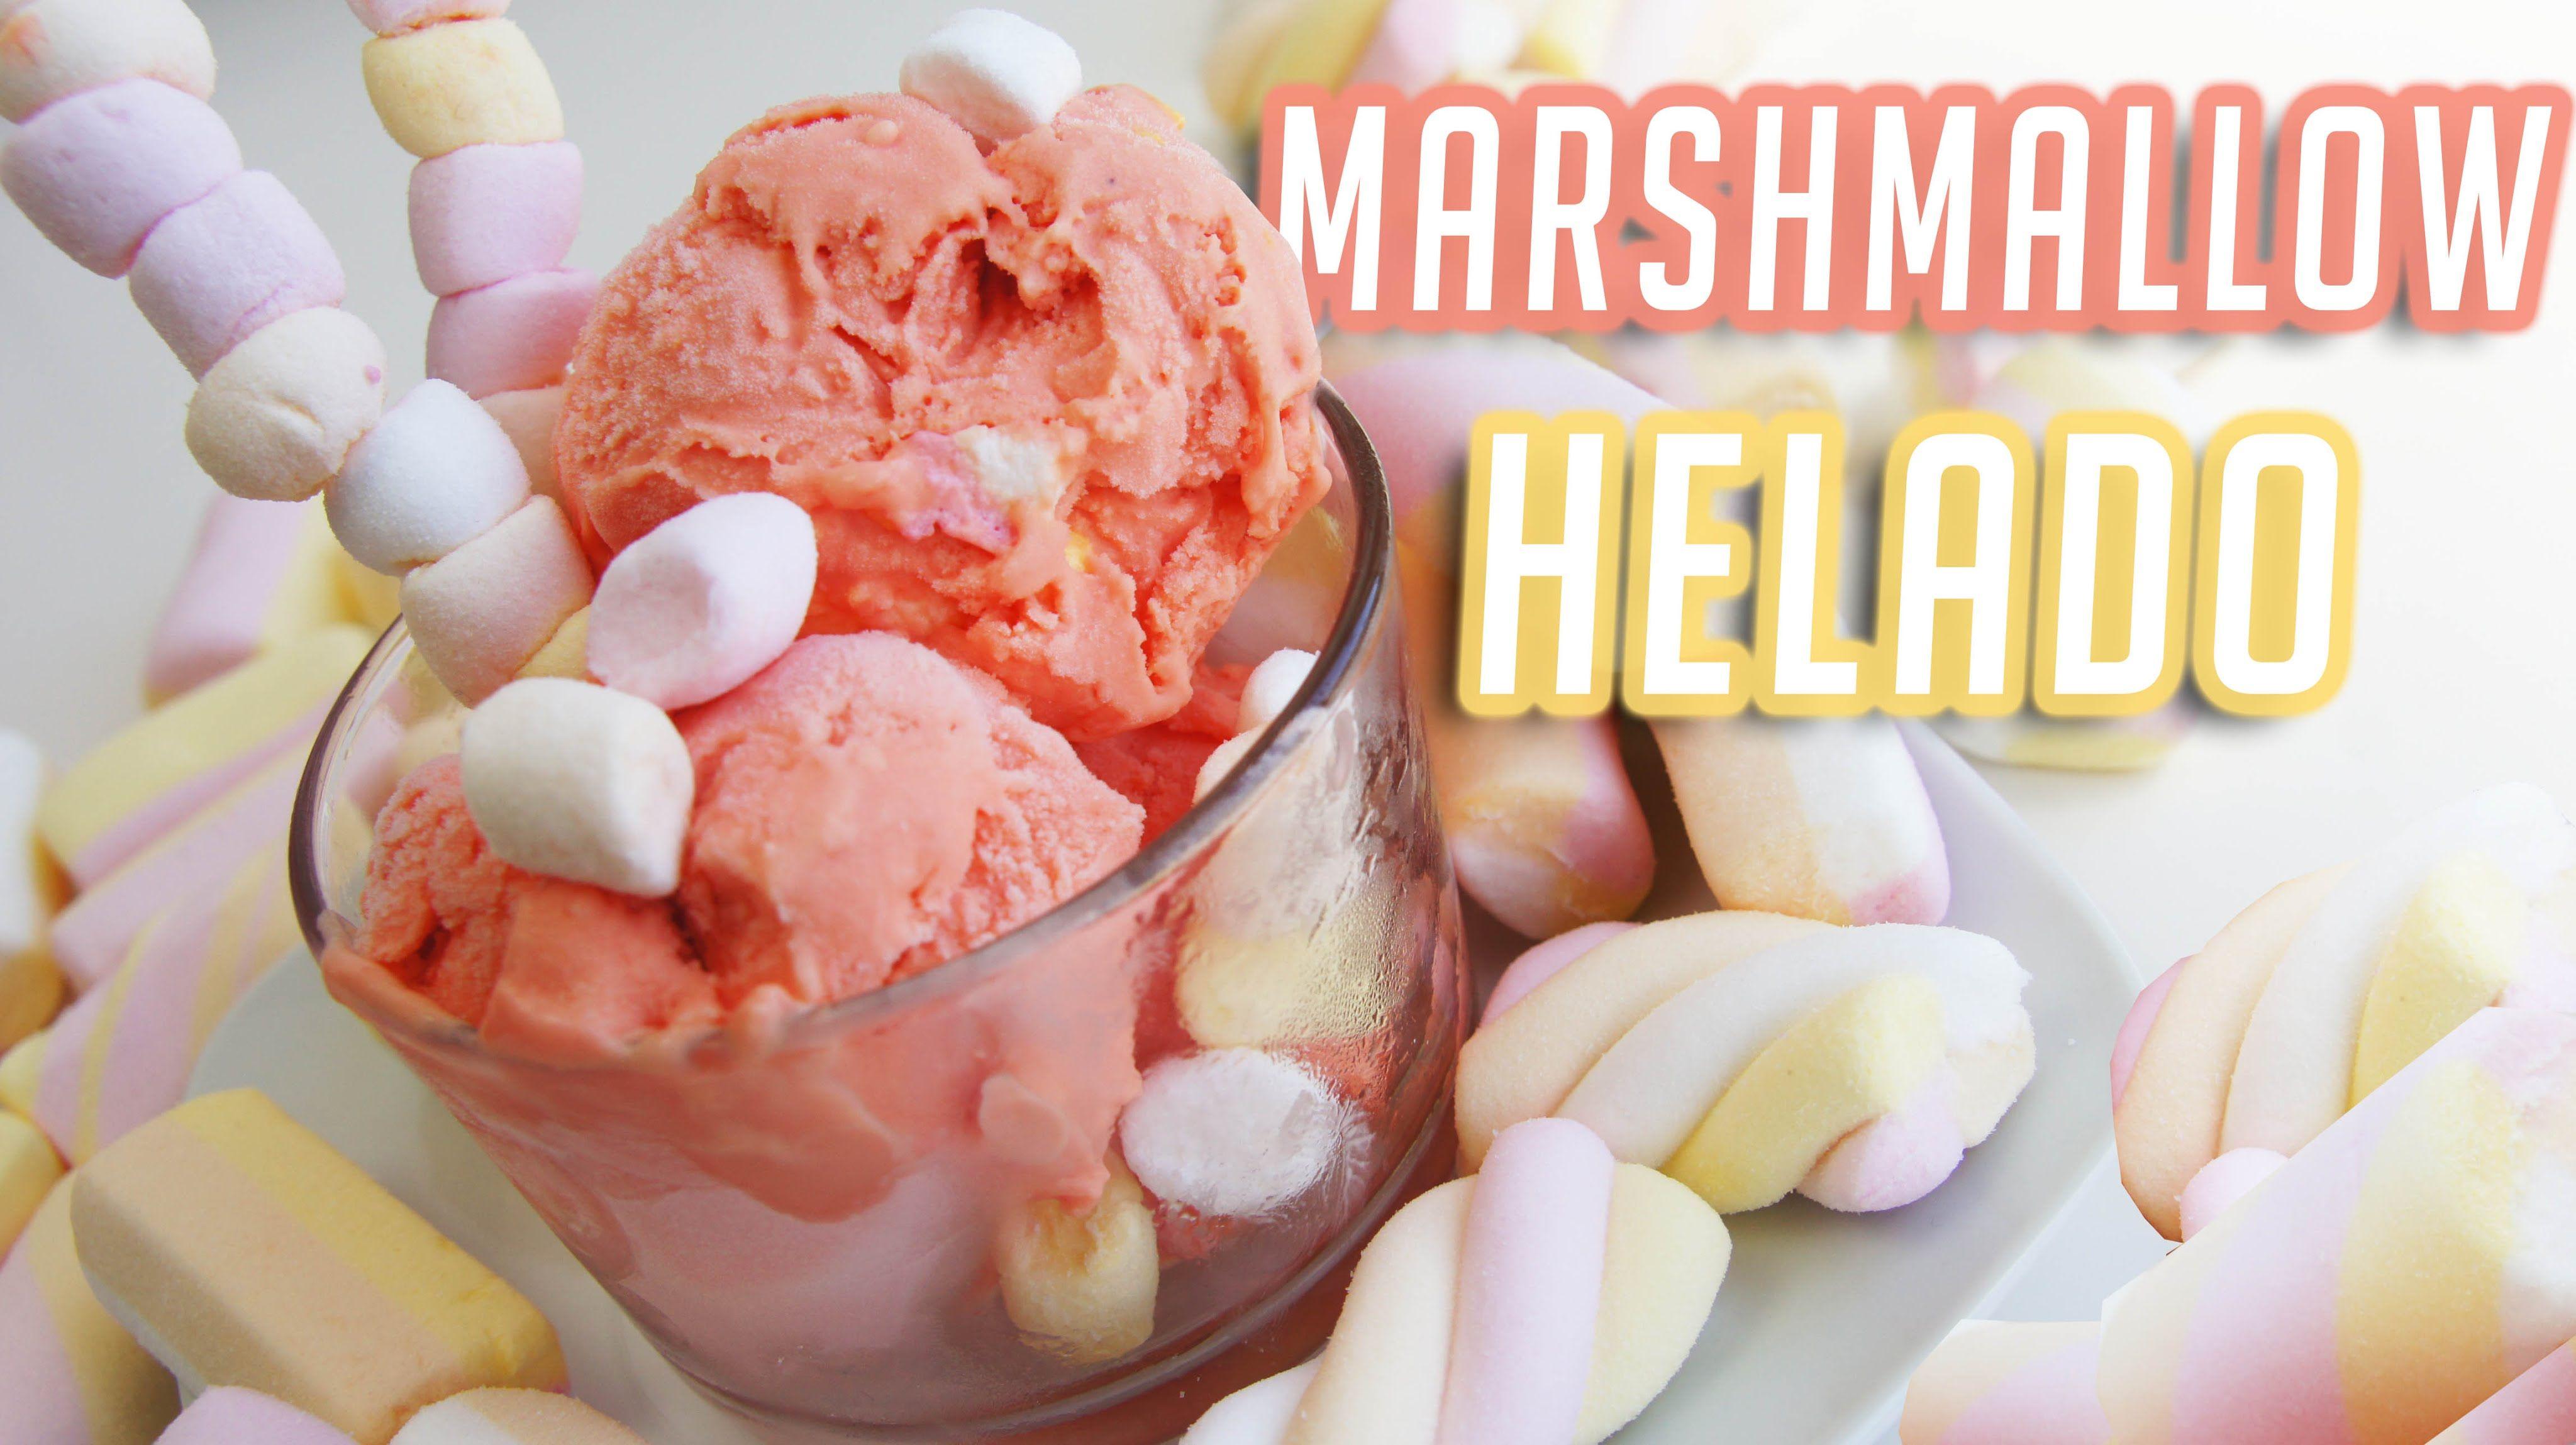 MARSHMALLOW HELADO CASERO !/MARSHMALLOW HOMEMADE ICE CREAM!